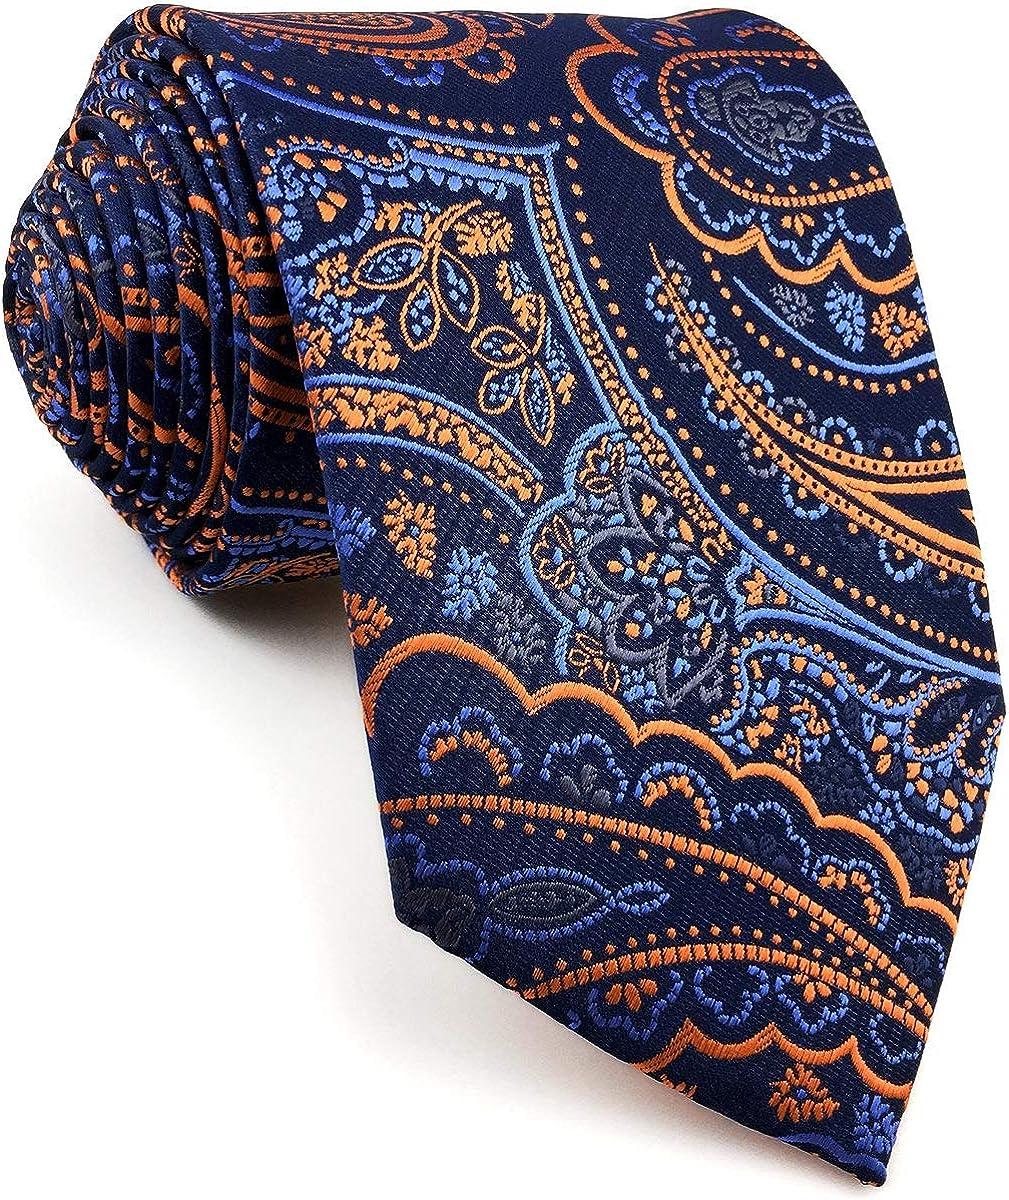 Now on sale SW SHLAXWING Men's Ties Neckties Navy Paisley Dark Louisville-Jefferson County Mall Blue